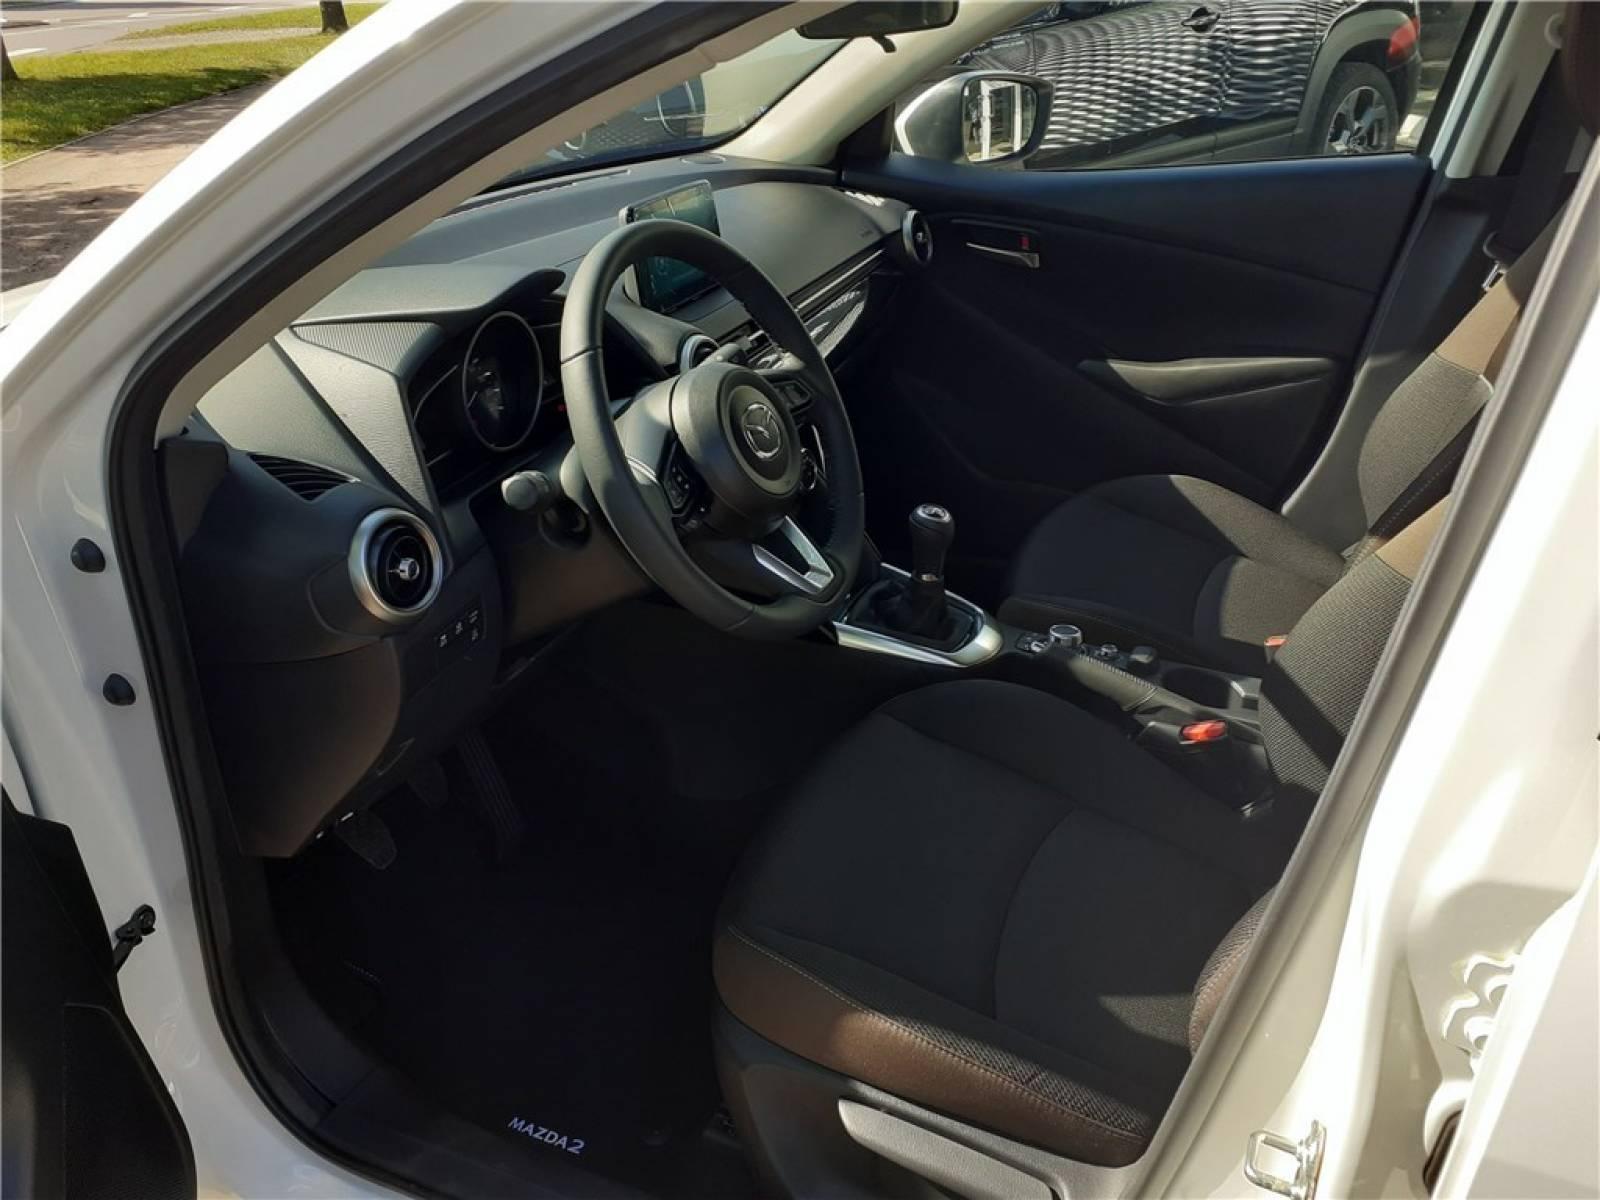 MAZDA Mazda2 1.5L SKYACTIV-G M Hybrid 90ch - véhicule d'occasion - Groupe Guillet - Chalon Automobiles - 71100 - Chalon-sur-Saône - 26